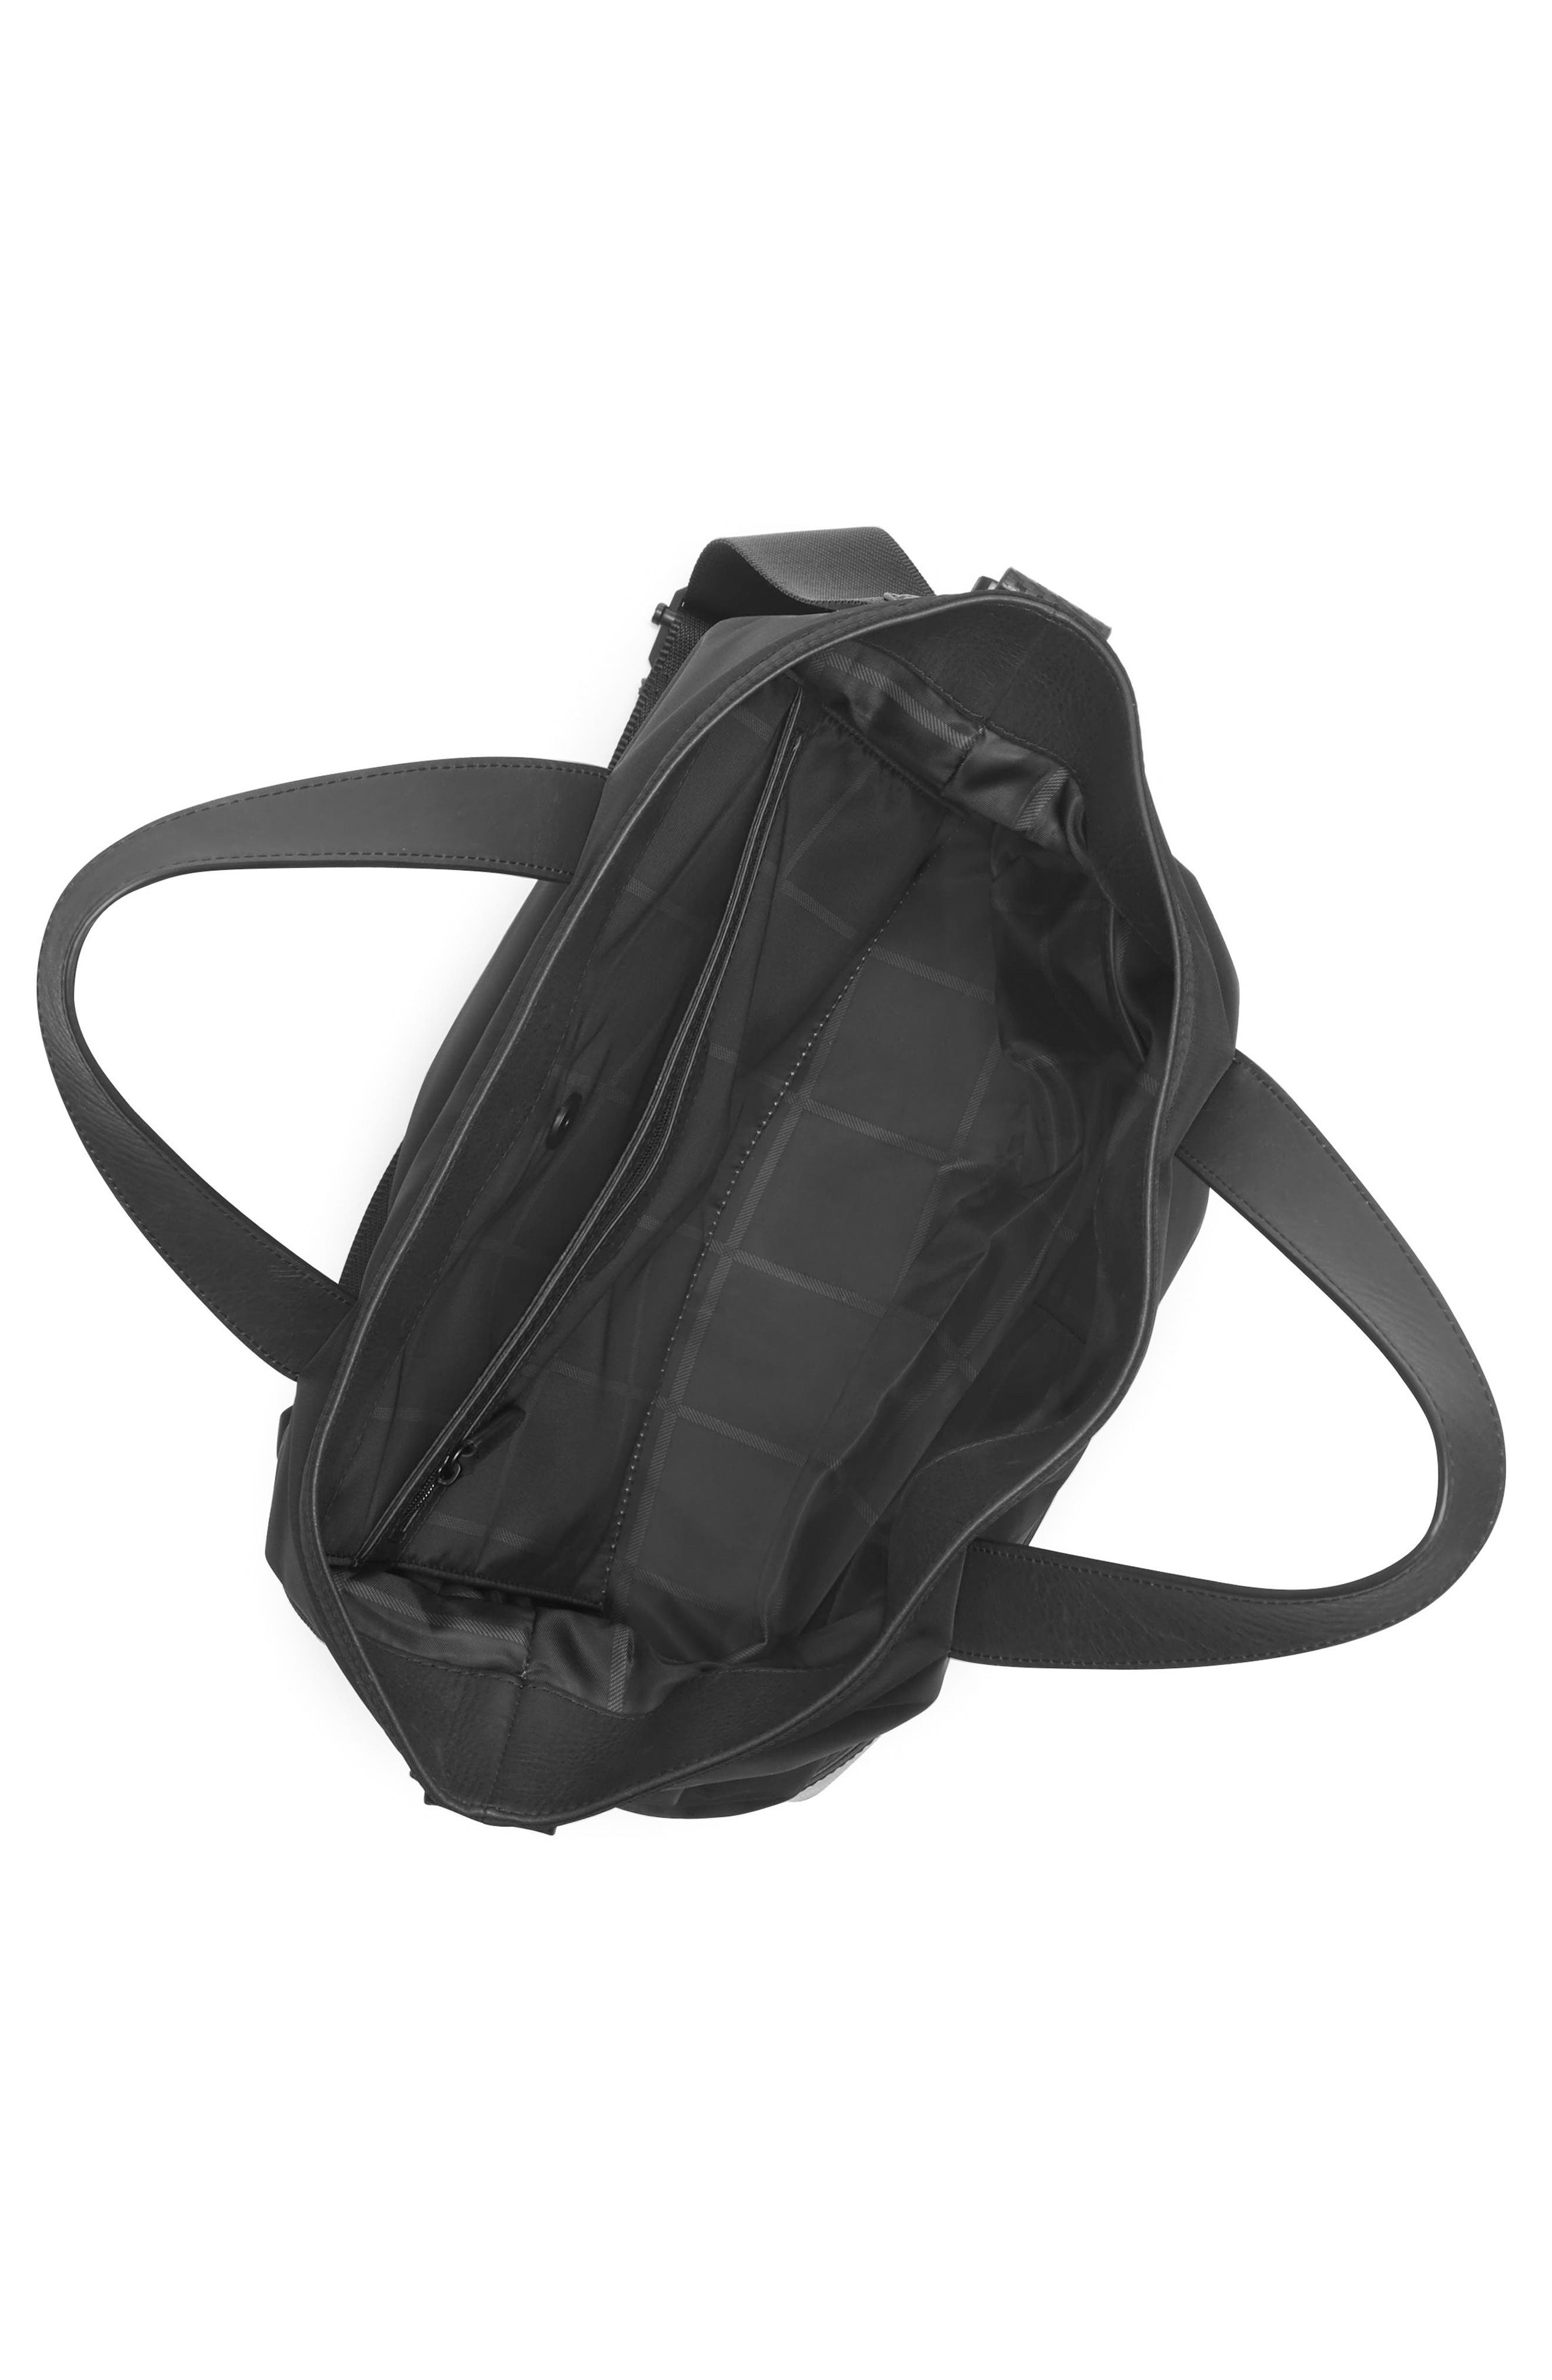 Lupe Tote Bag,                             Alternate thumbnail 3, color,                             002